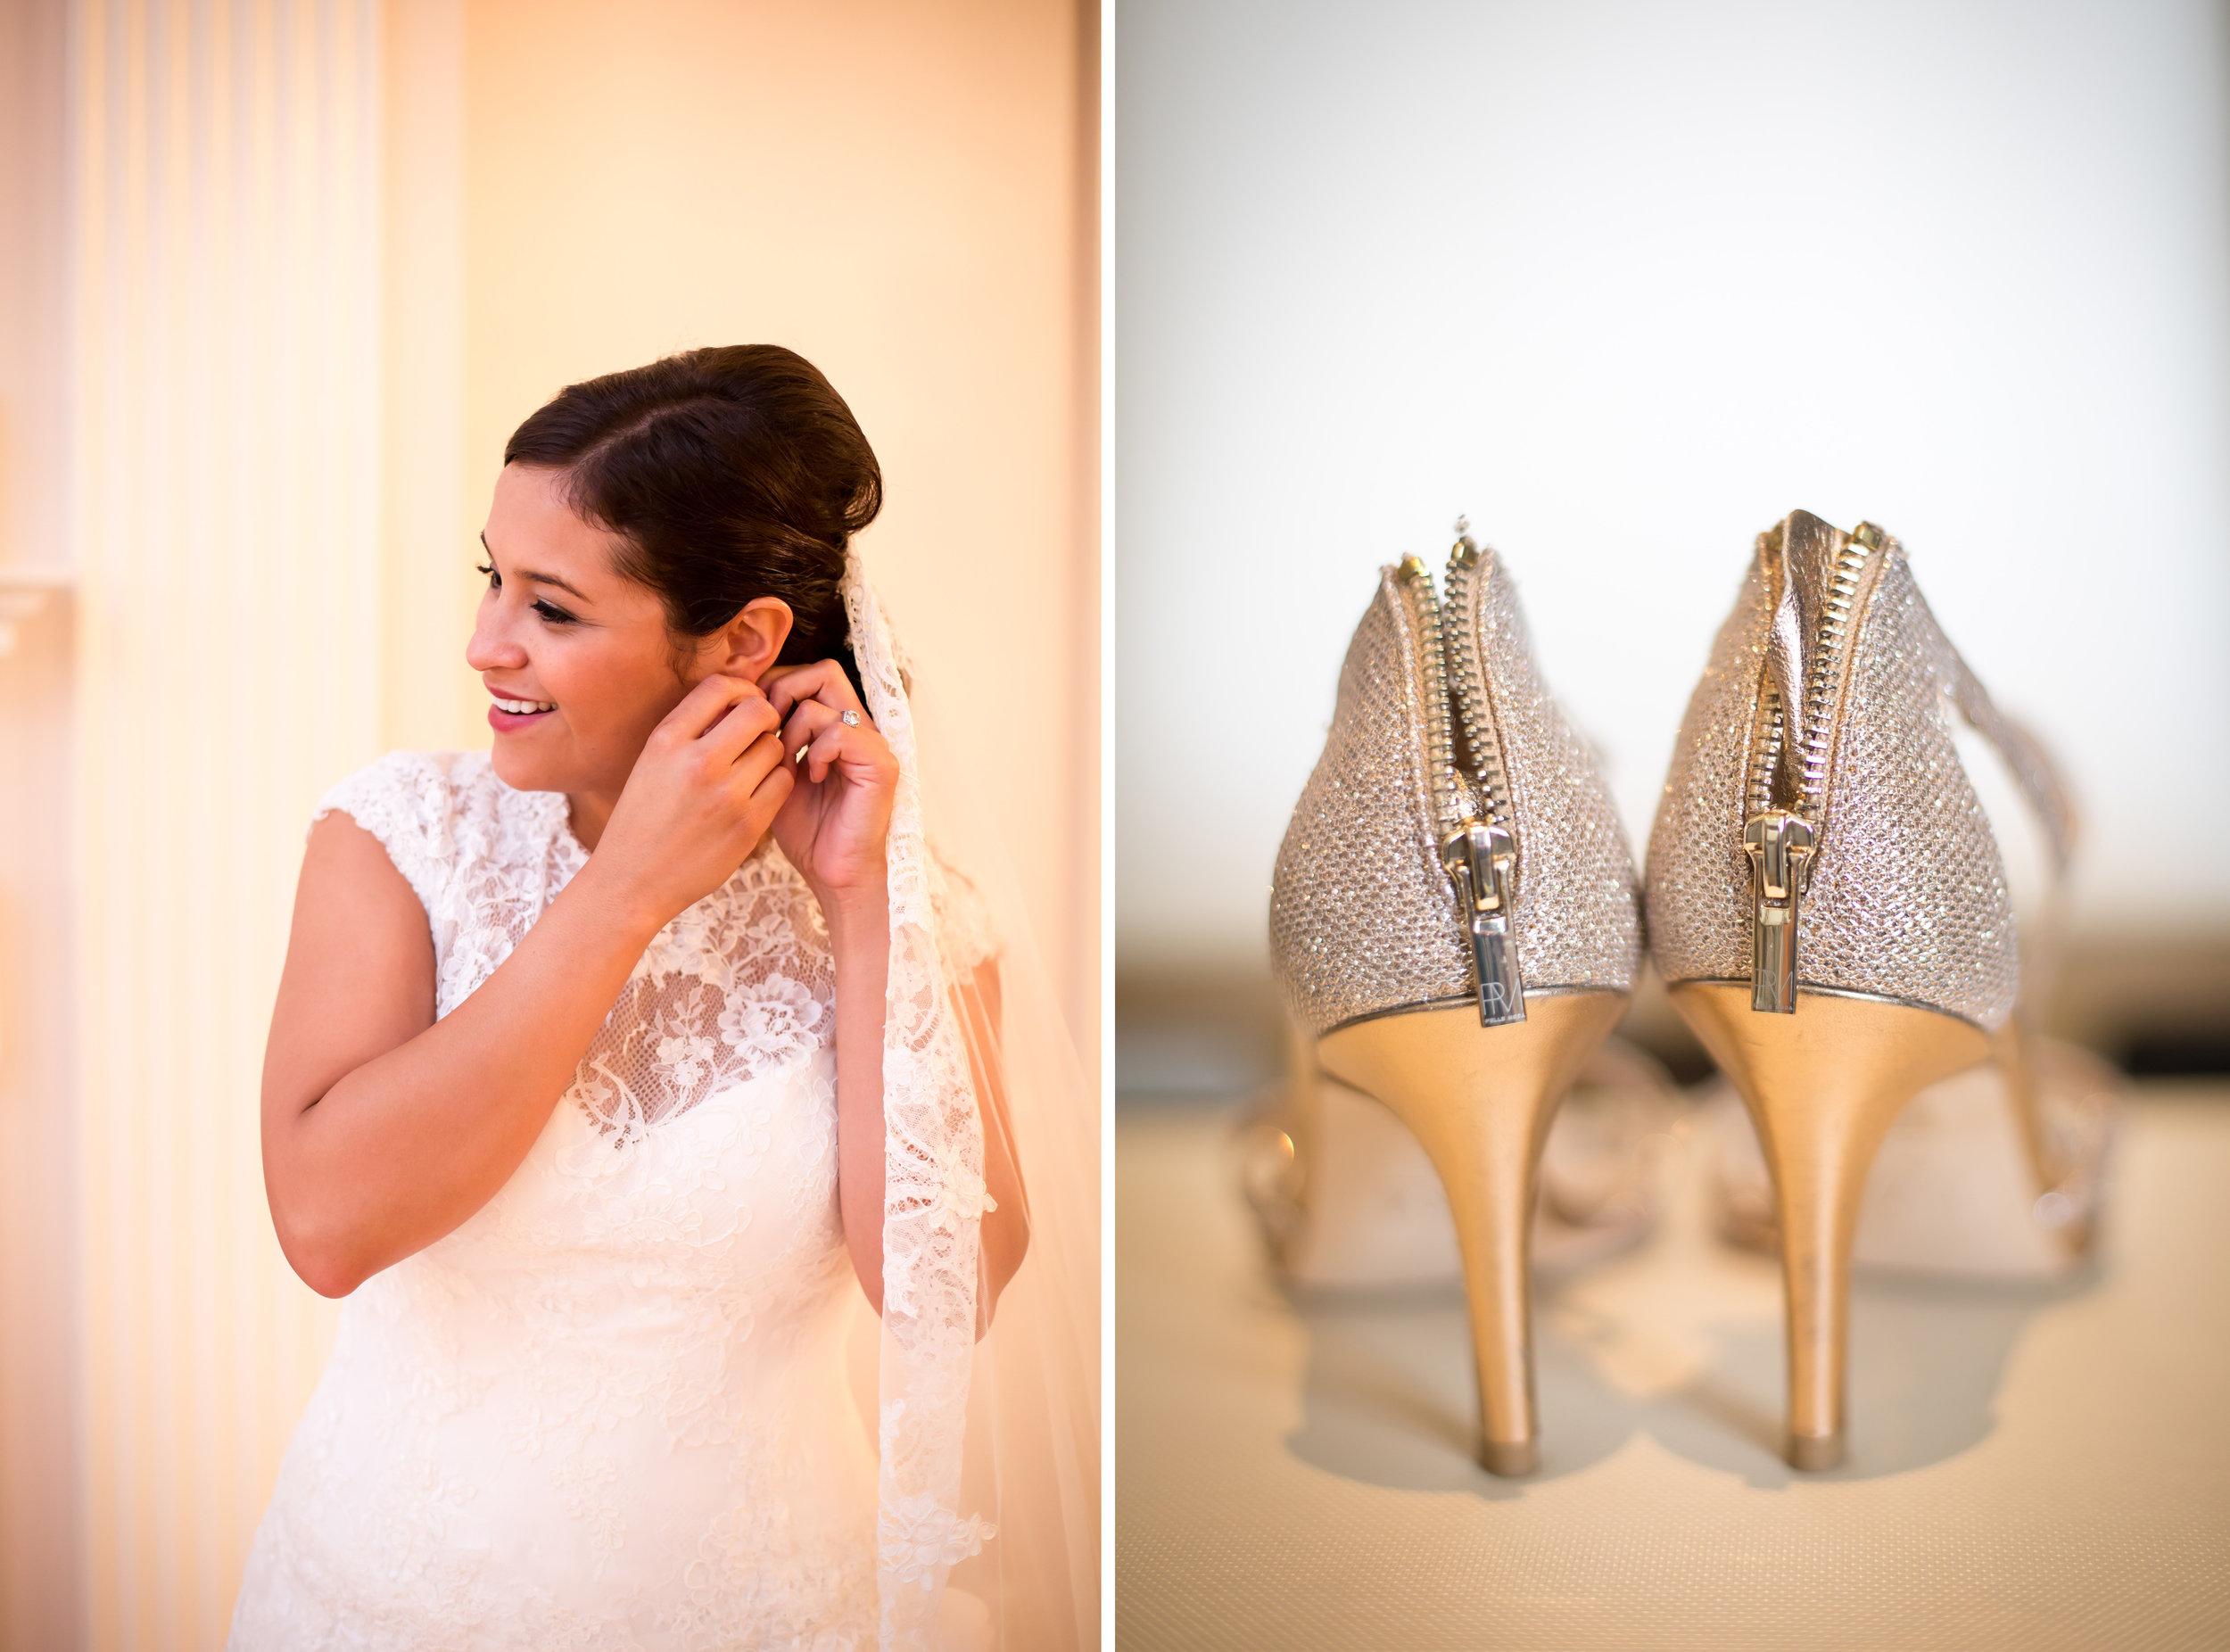 Marble_Falls_Horseshoe_Bay_Photographer_Torres_Wedding_37.jpg